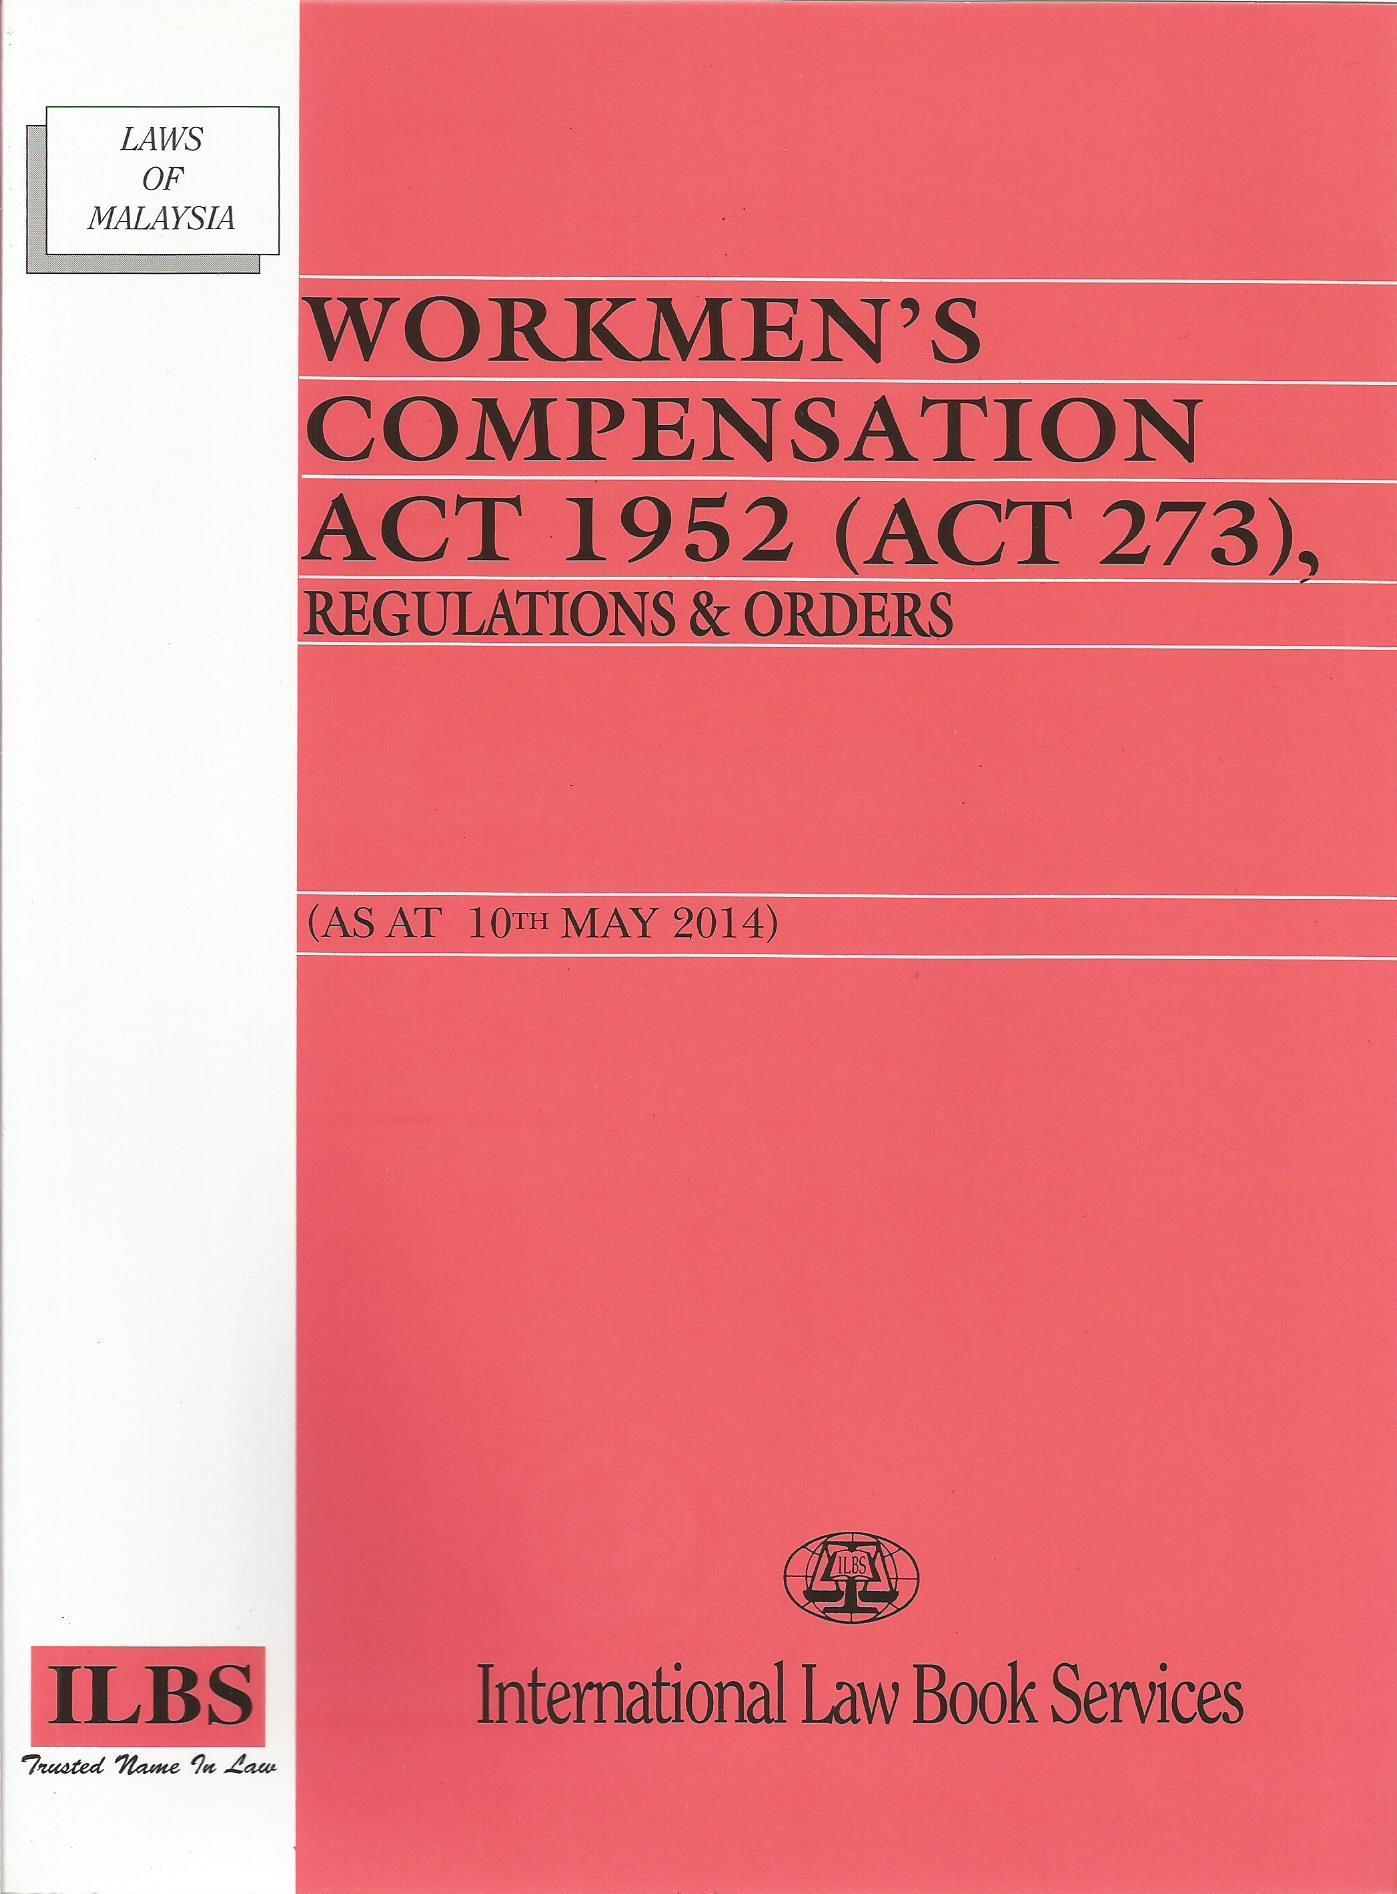 workmens compensation rm22.5 0.2750001.jpg